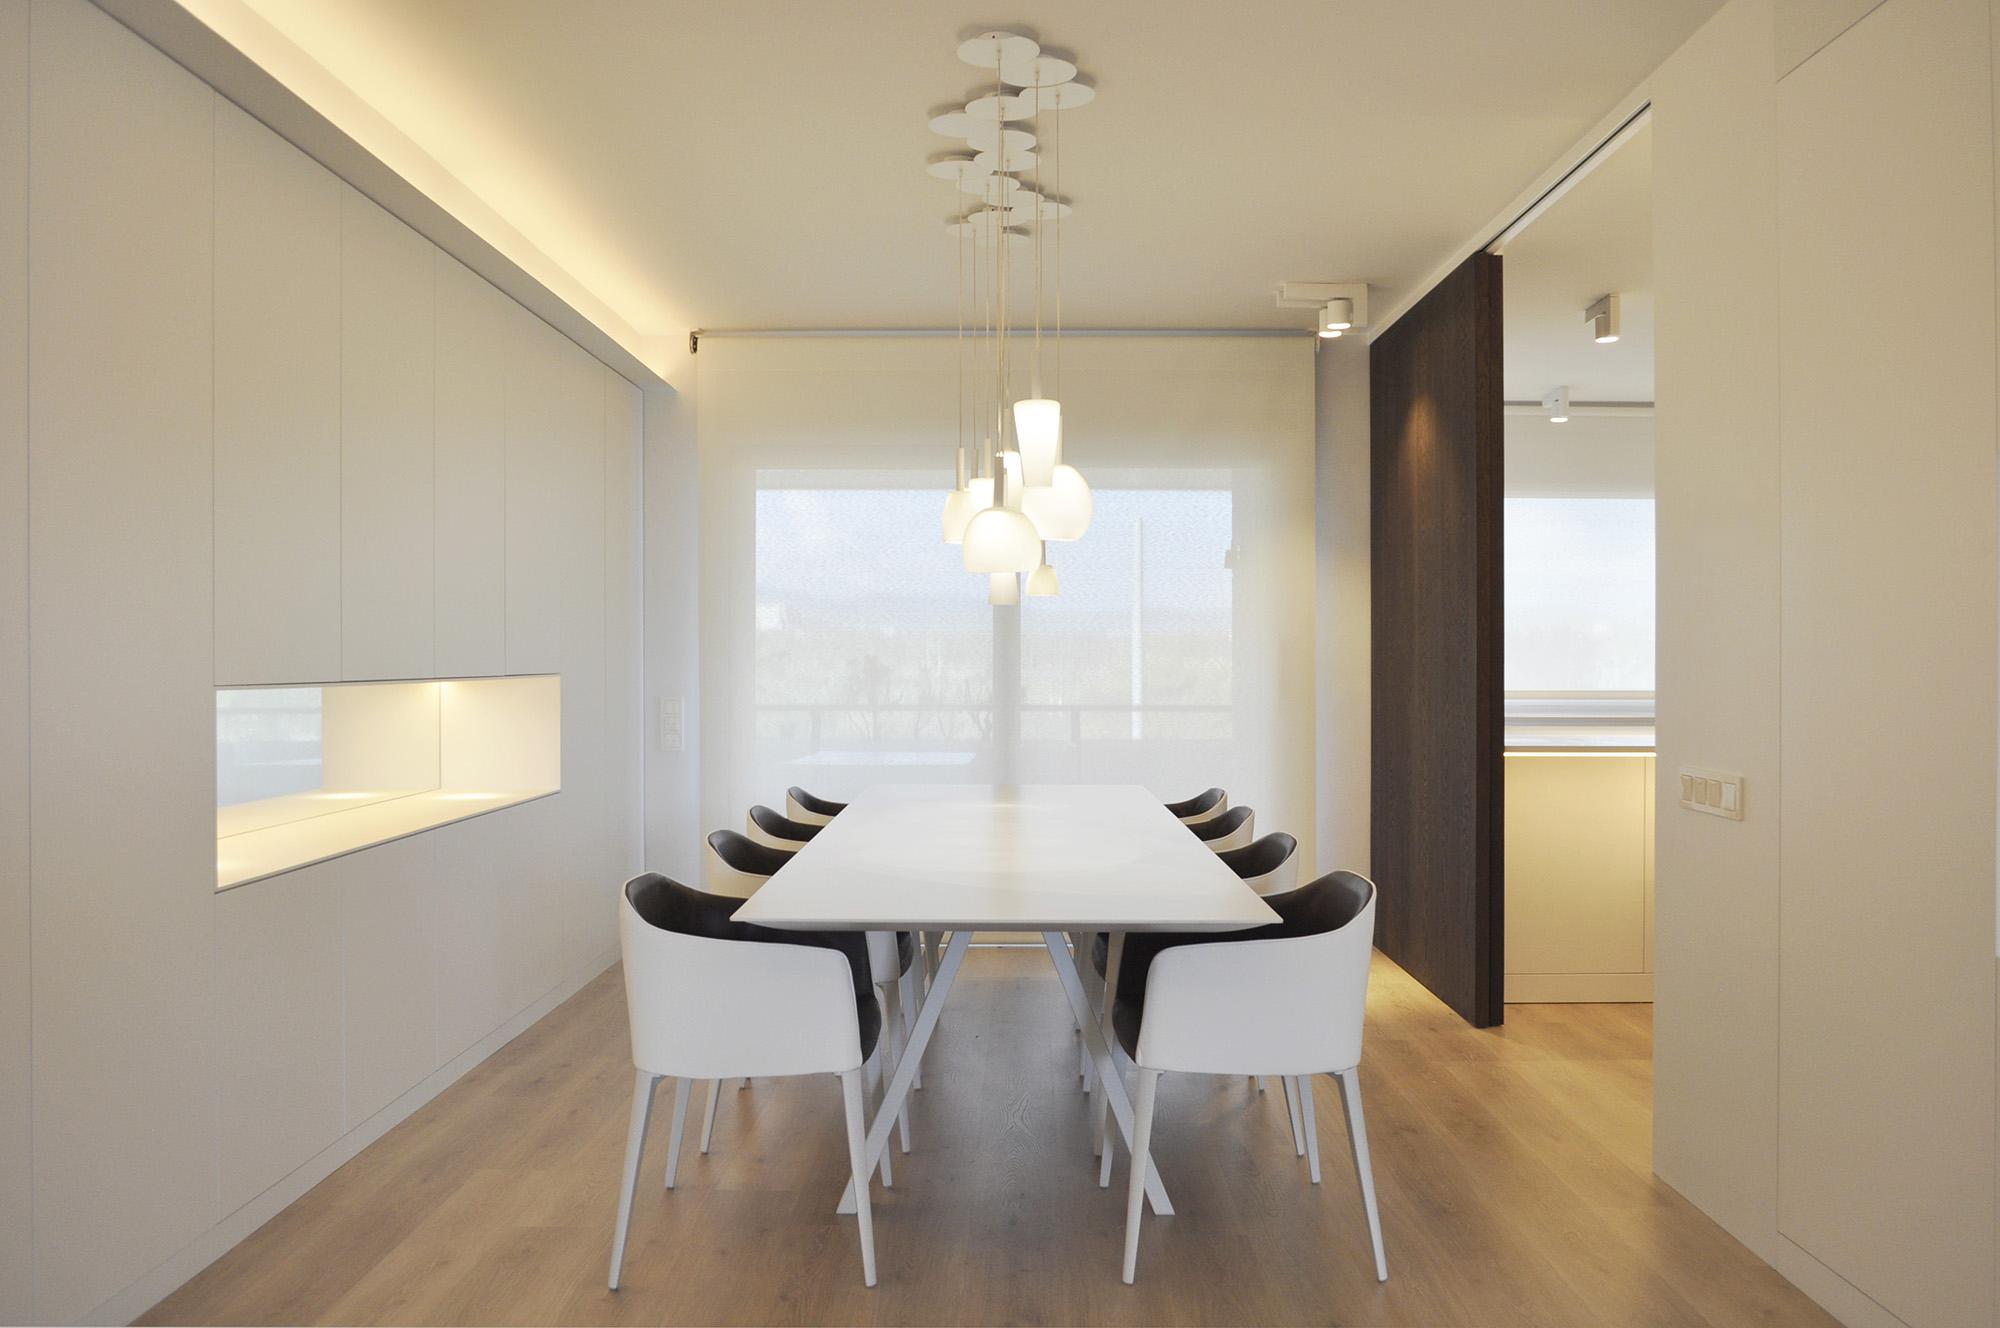 5-interor-designer-barcelona-sitges-dining-area-refurbishment